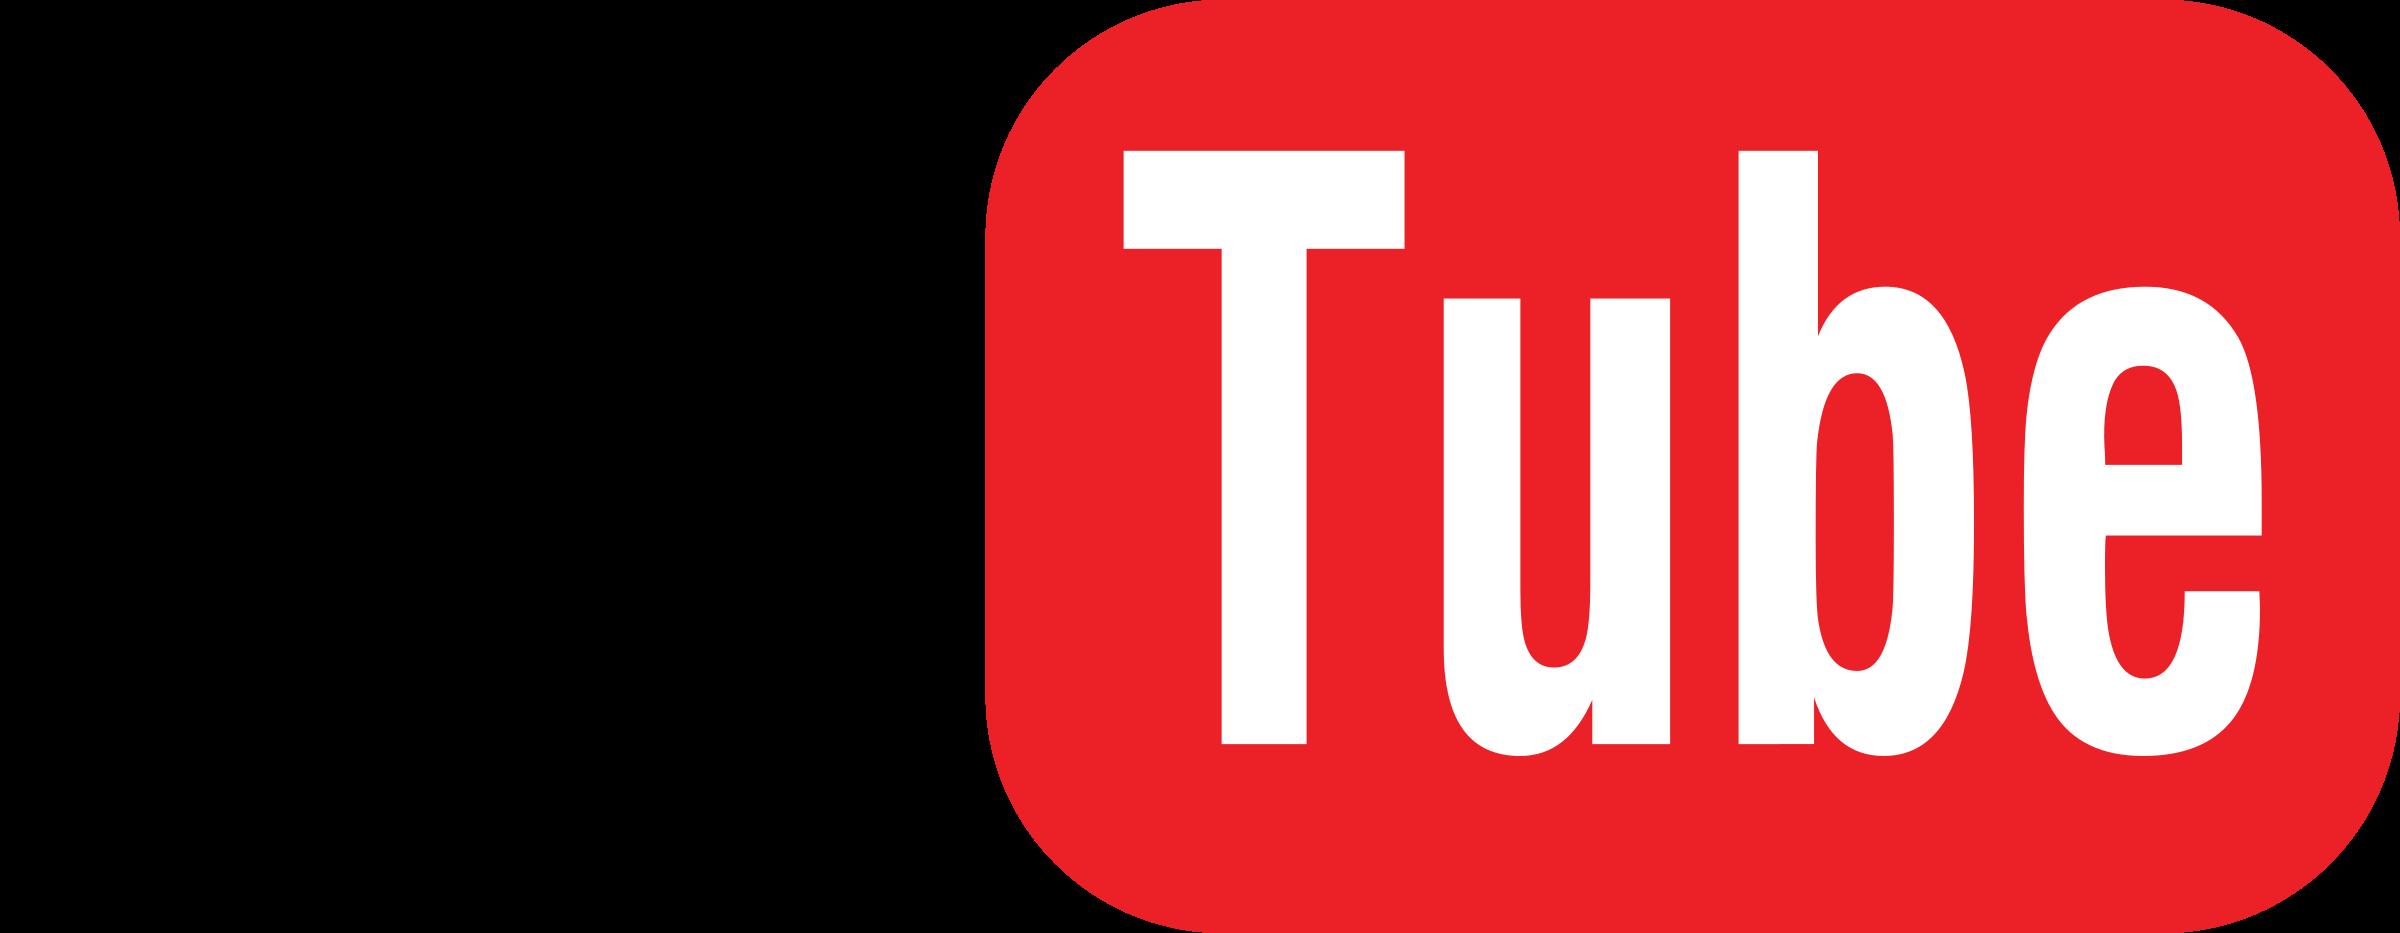 HD Youtube Logo Png Transparent.